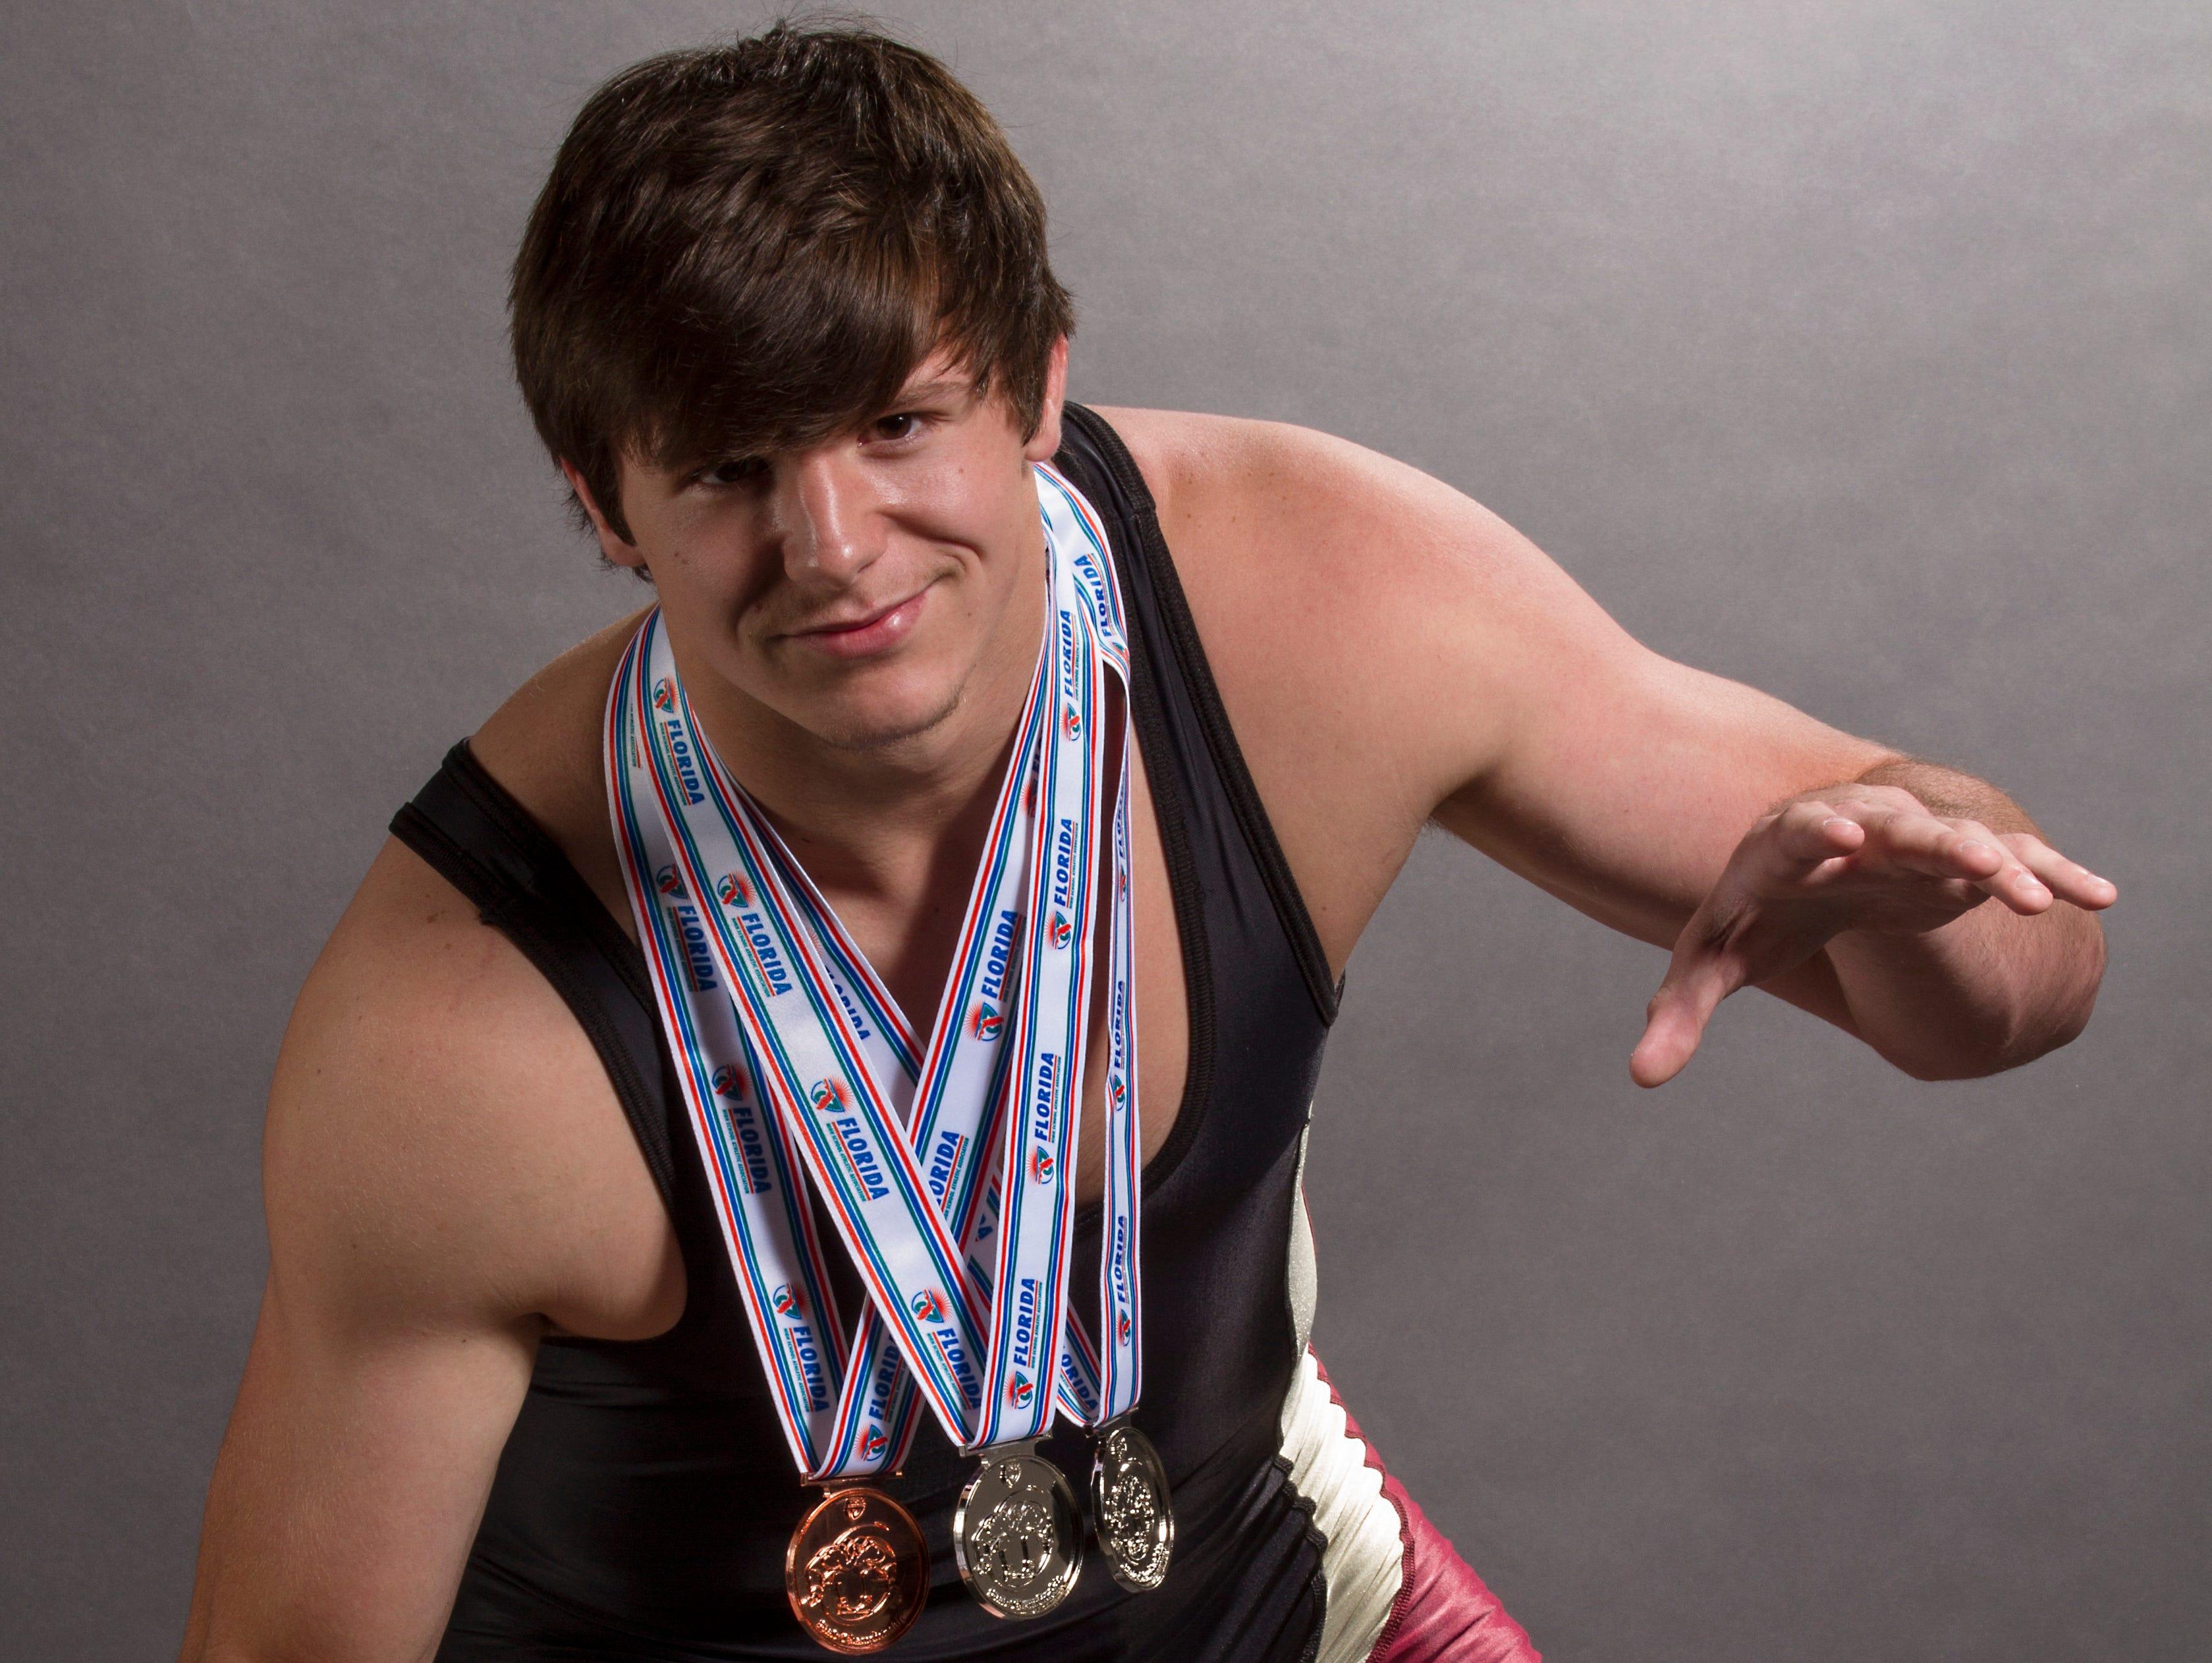 Jesse Pryor, 17, is a senior wrestler at Riverdale High School.